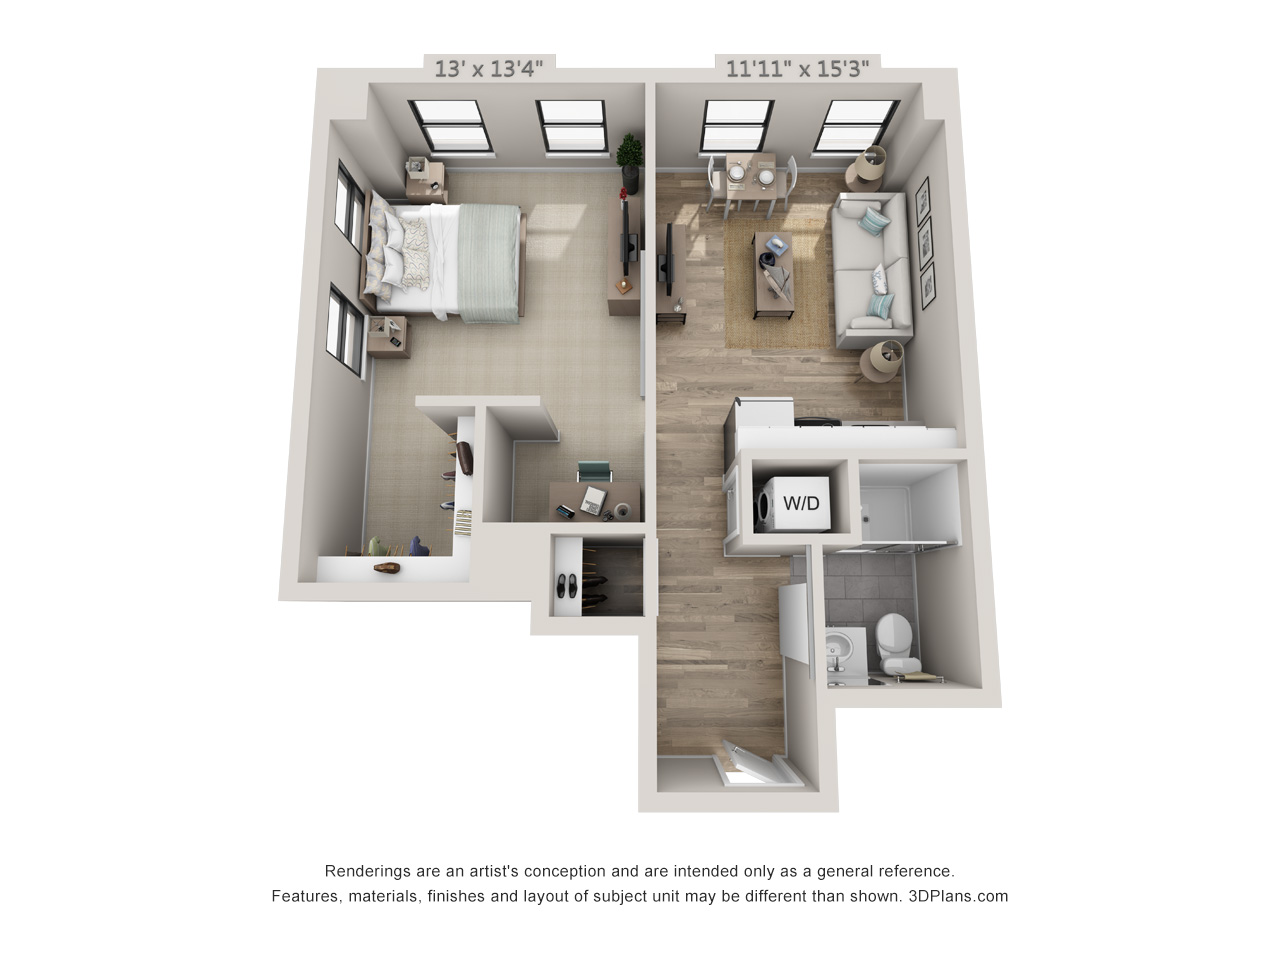 1 Bed apartment in Philadelphia